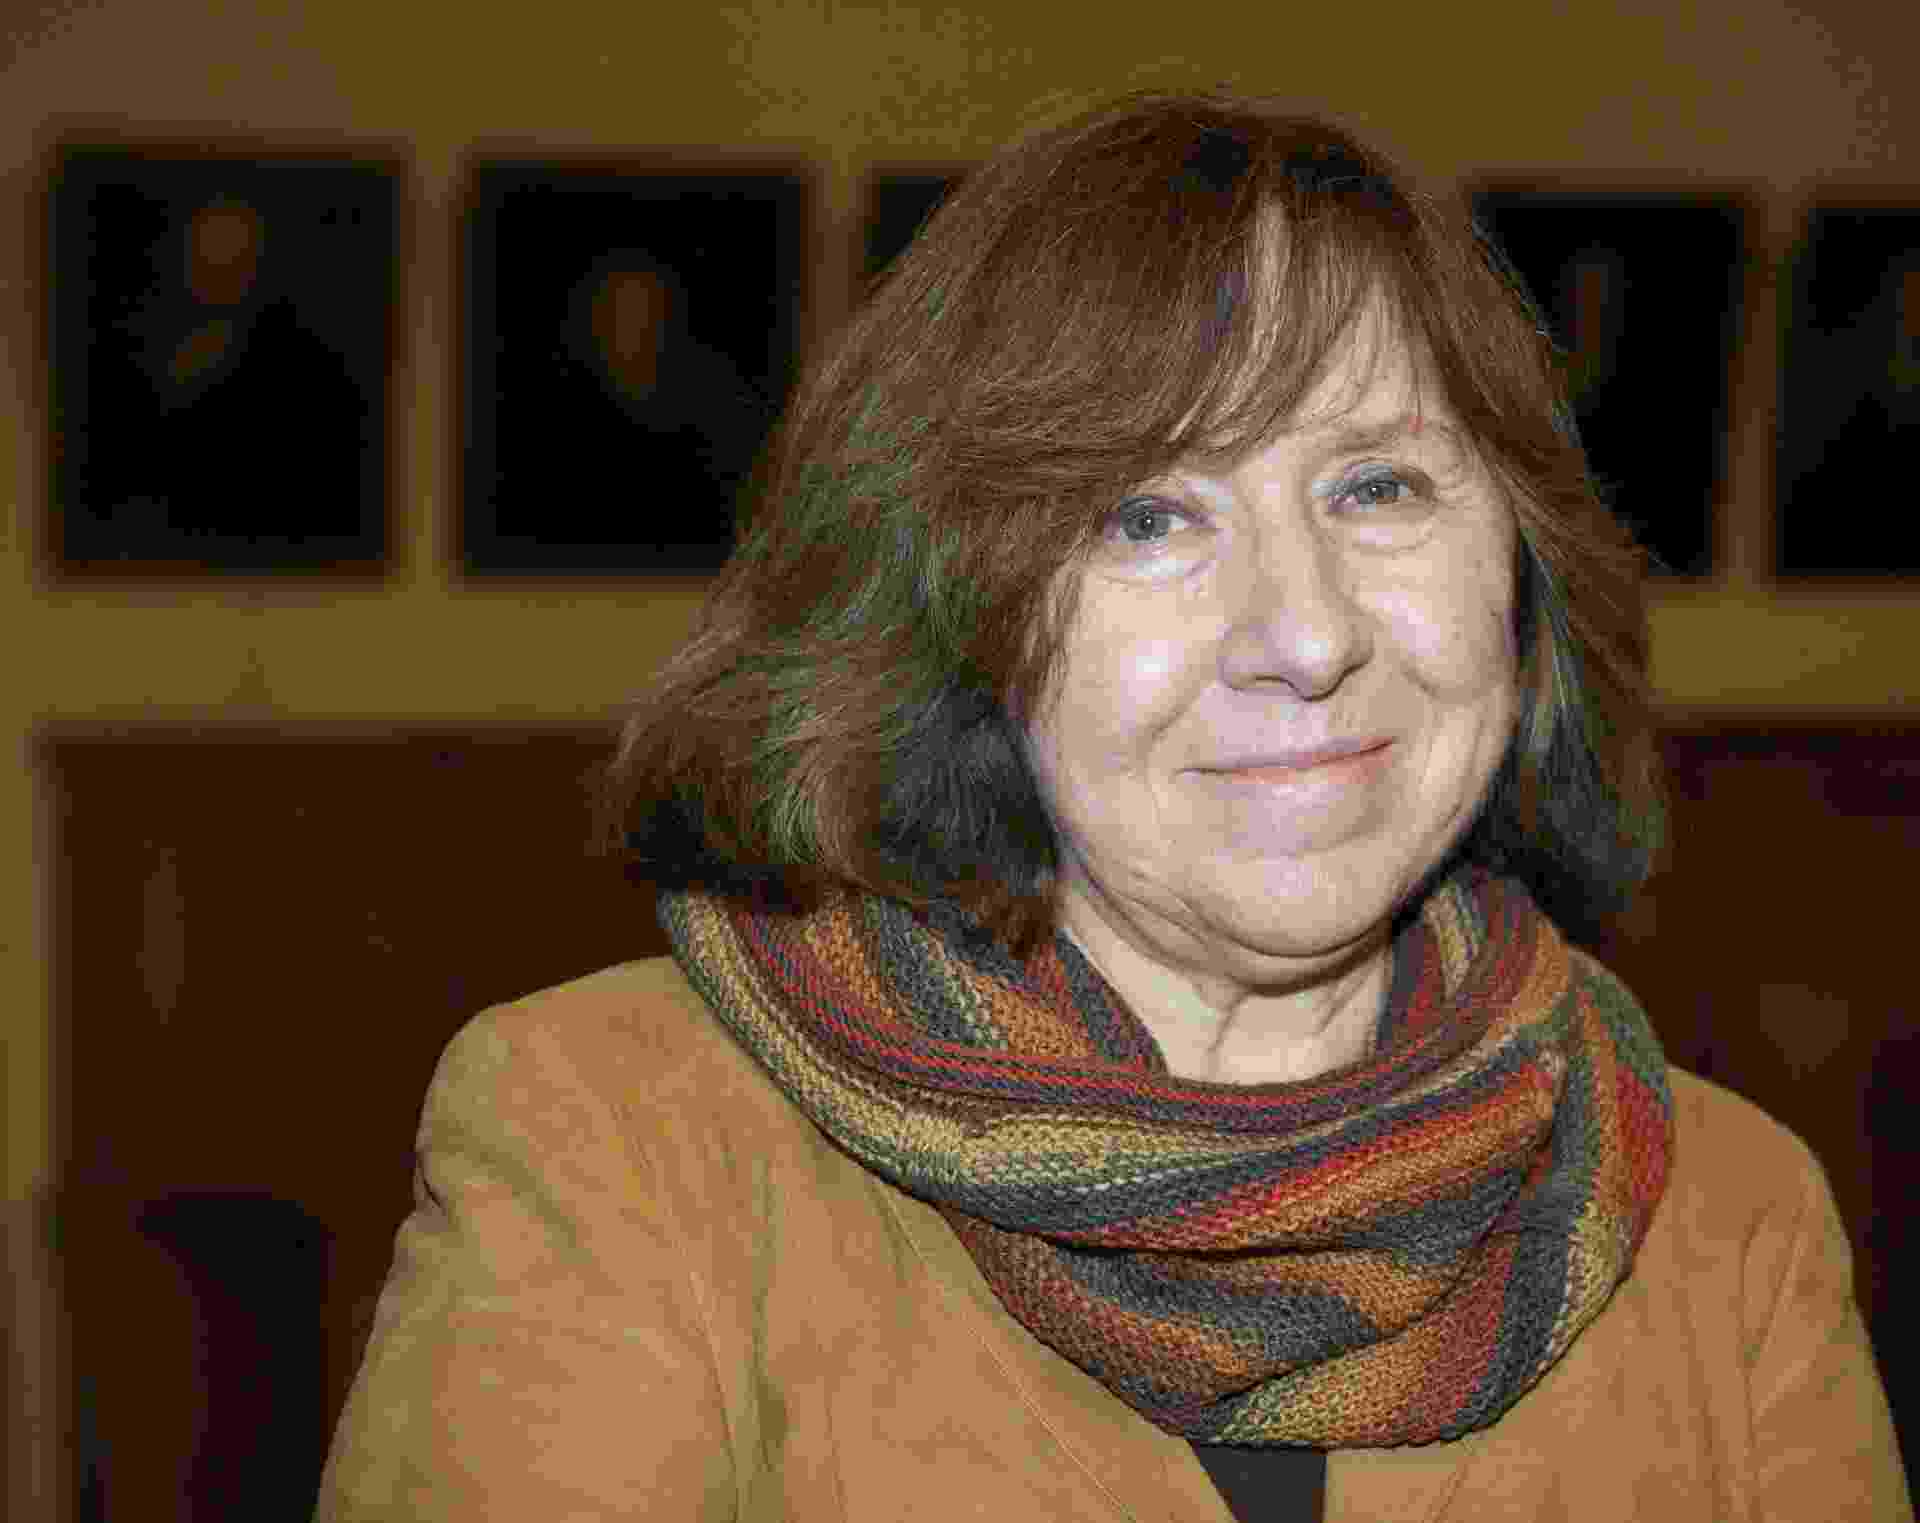 15.out.2013 - A bielorrusa Svetlana Alexievich em Leipzig, na Alemanha - Peter Endig/EFE